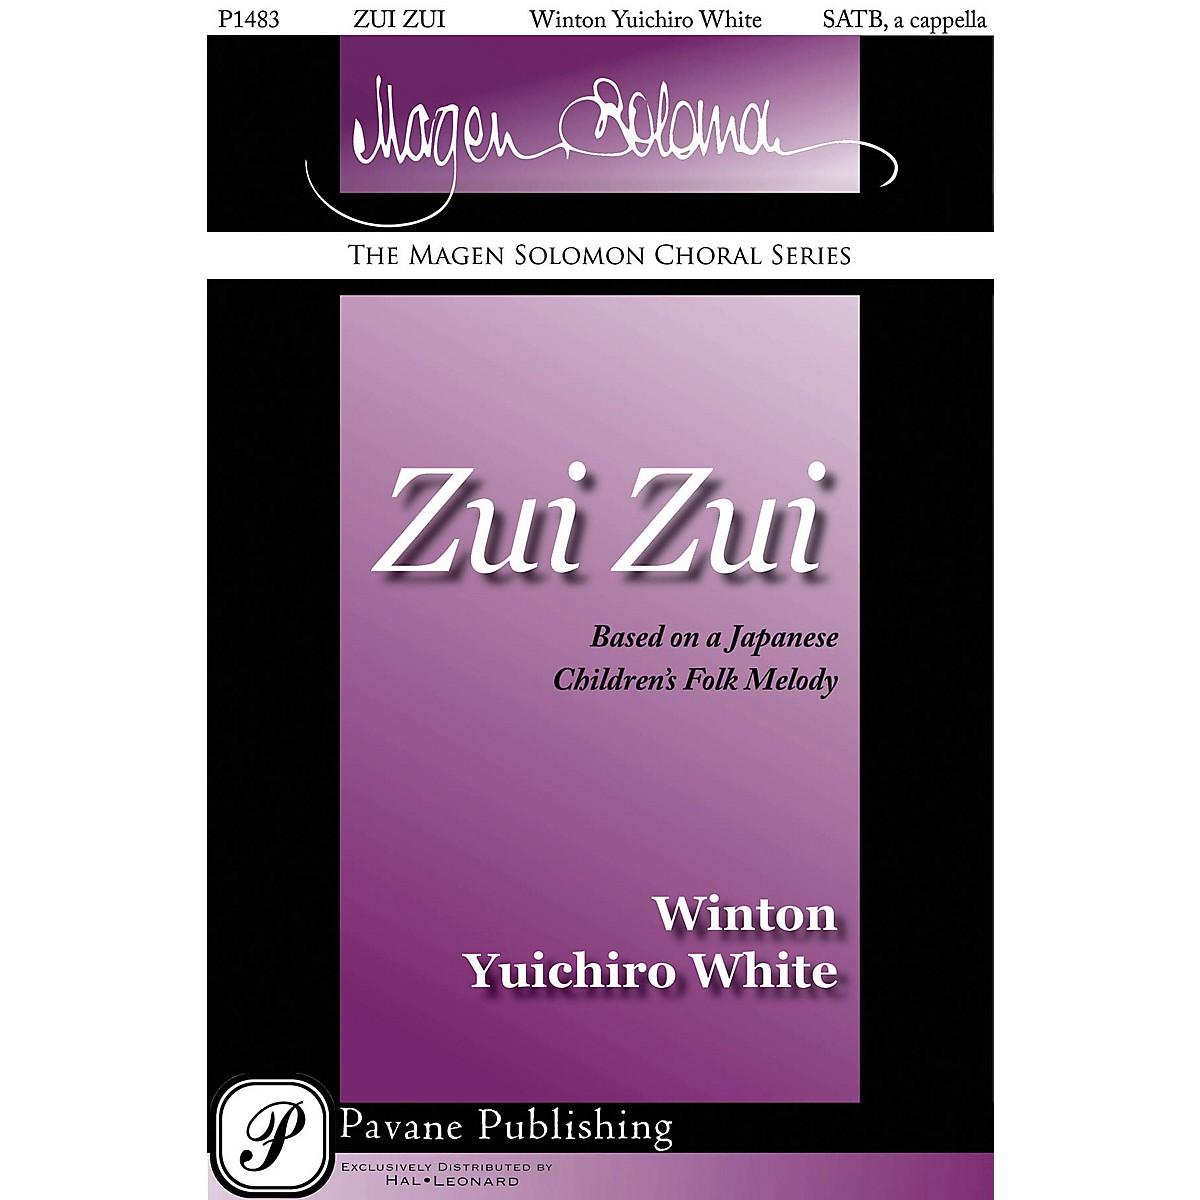 Pavane Zui Zui SATB a cappella arranged by Winton Yuichiro White